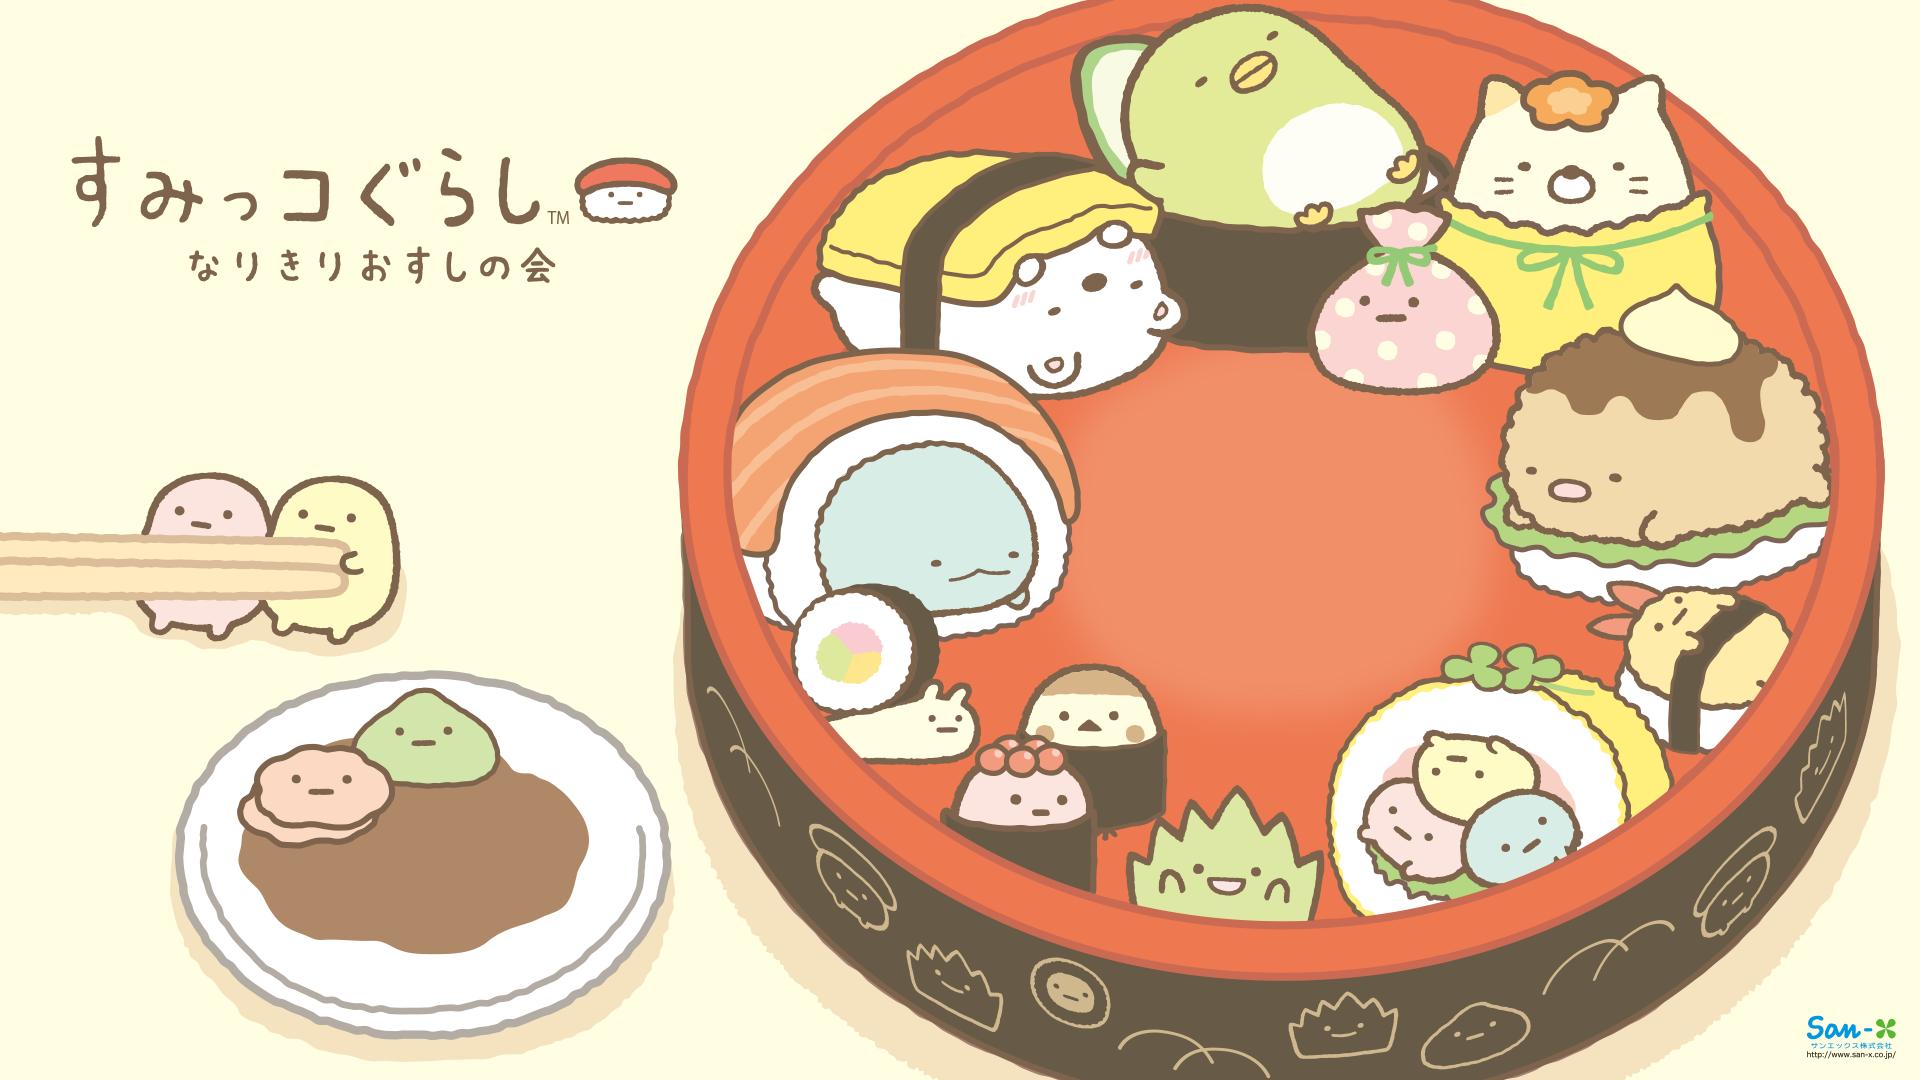 10_1080_1920.png (1920×1080) Cute food wallpaper, Kawaii